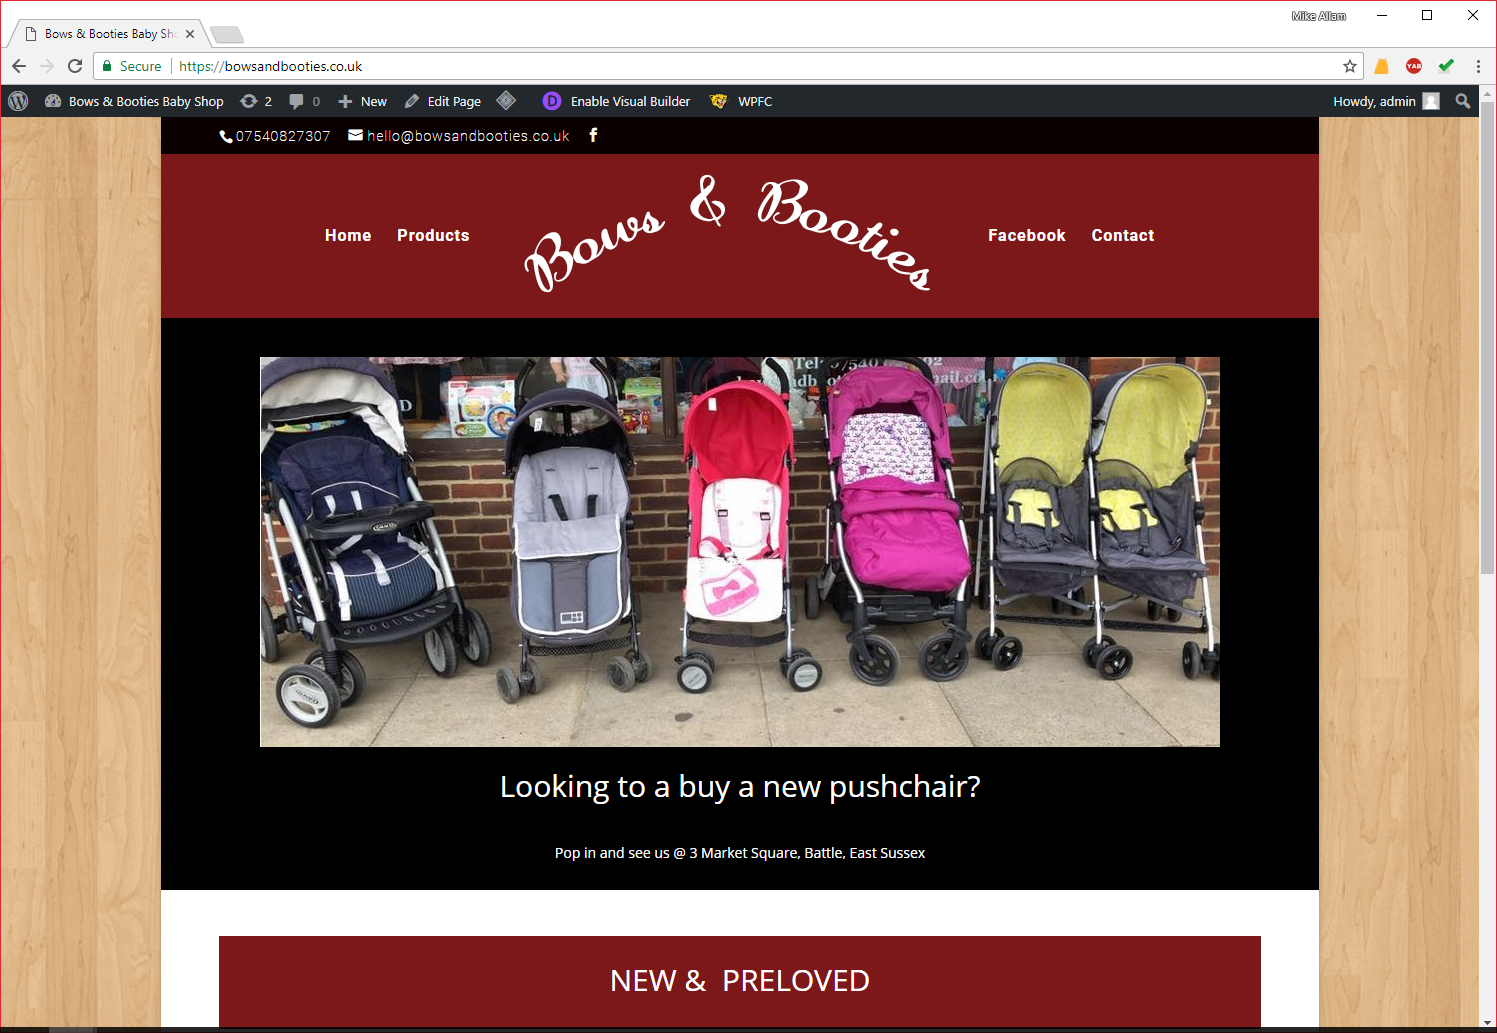 Bows & Booties Web Design